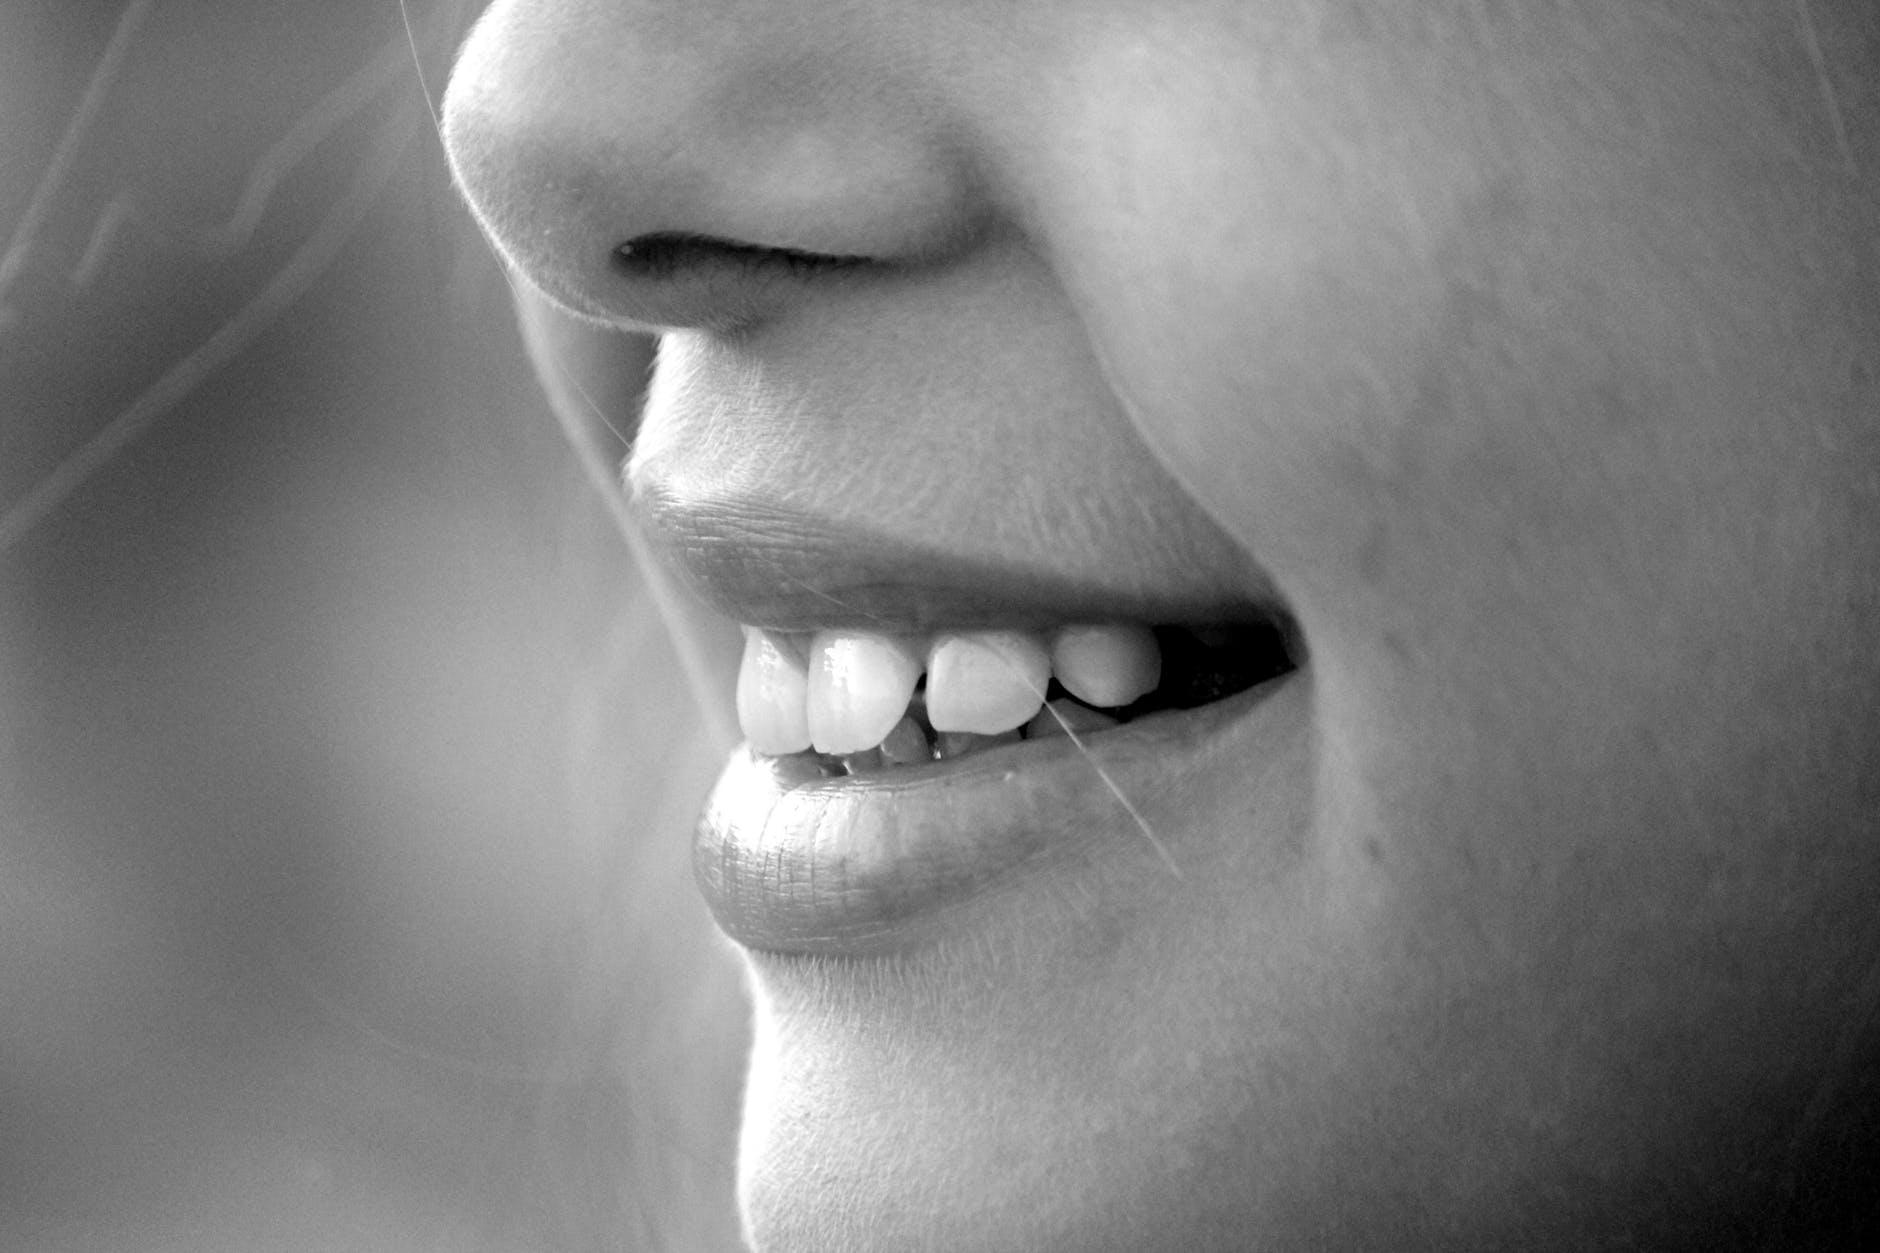 Teeth in winter